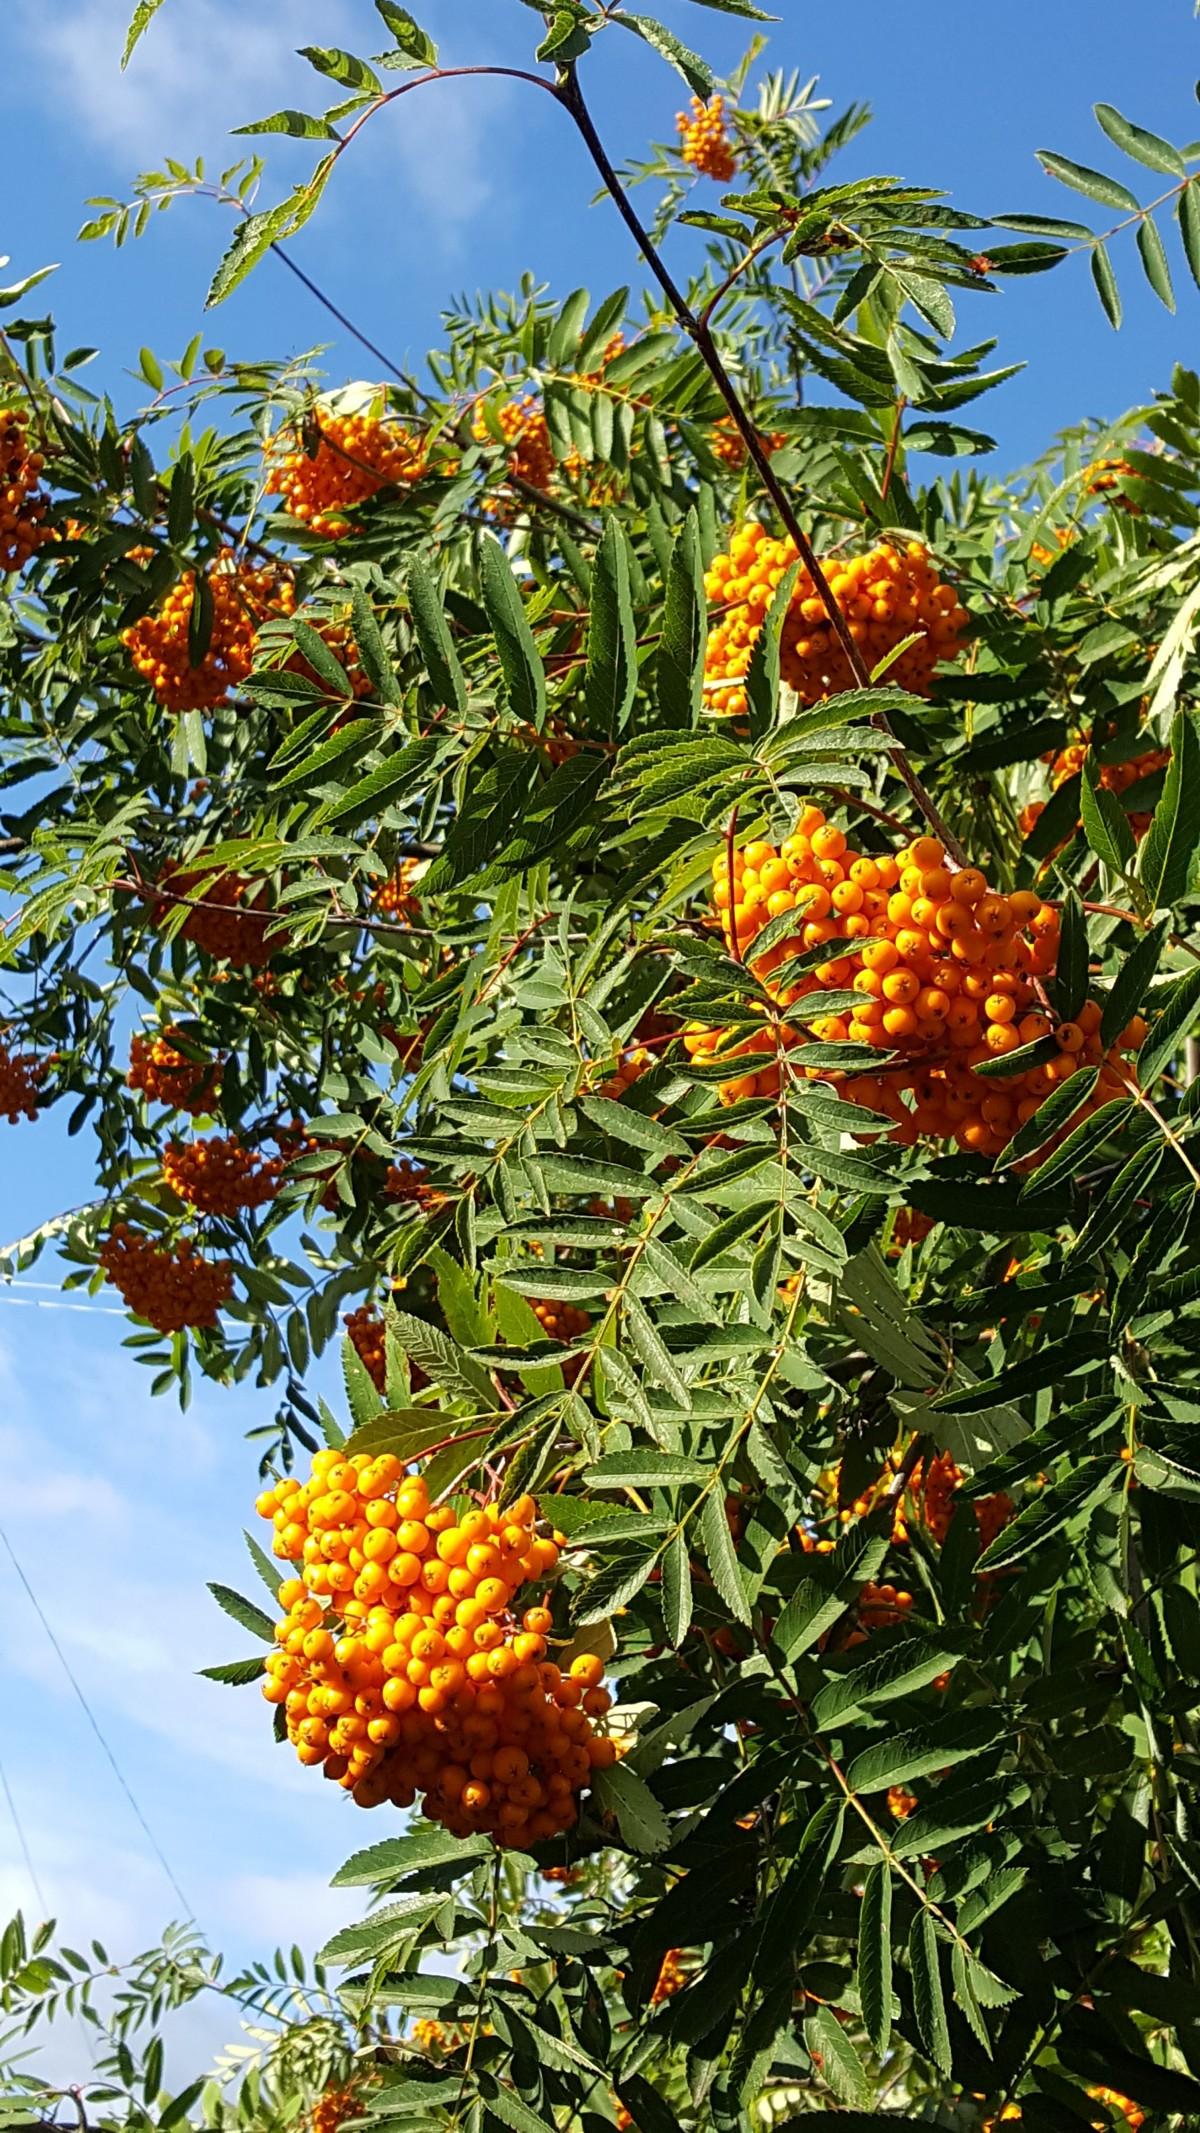 Fotos gratis rbol rama fruta baya hoja flor for Arbol rojo jardin